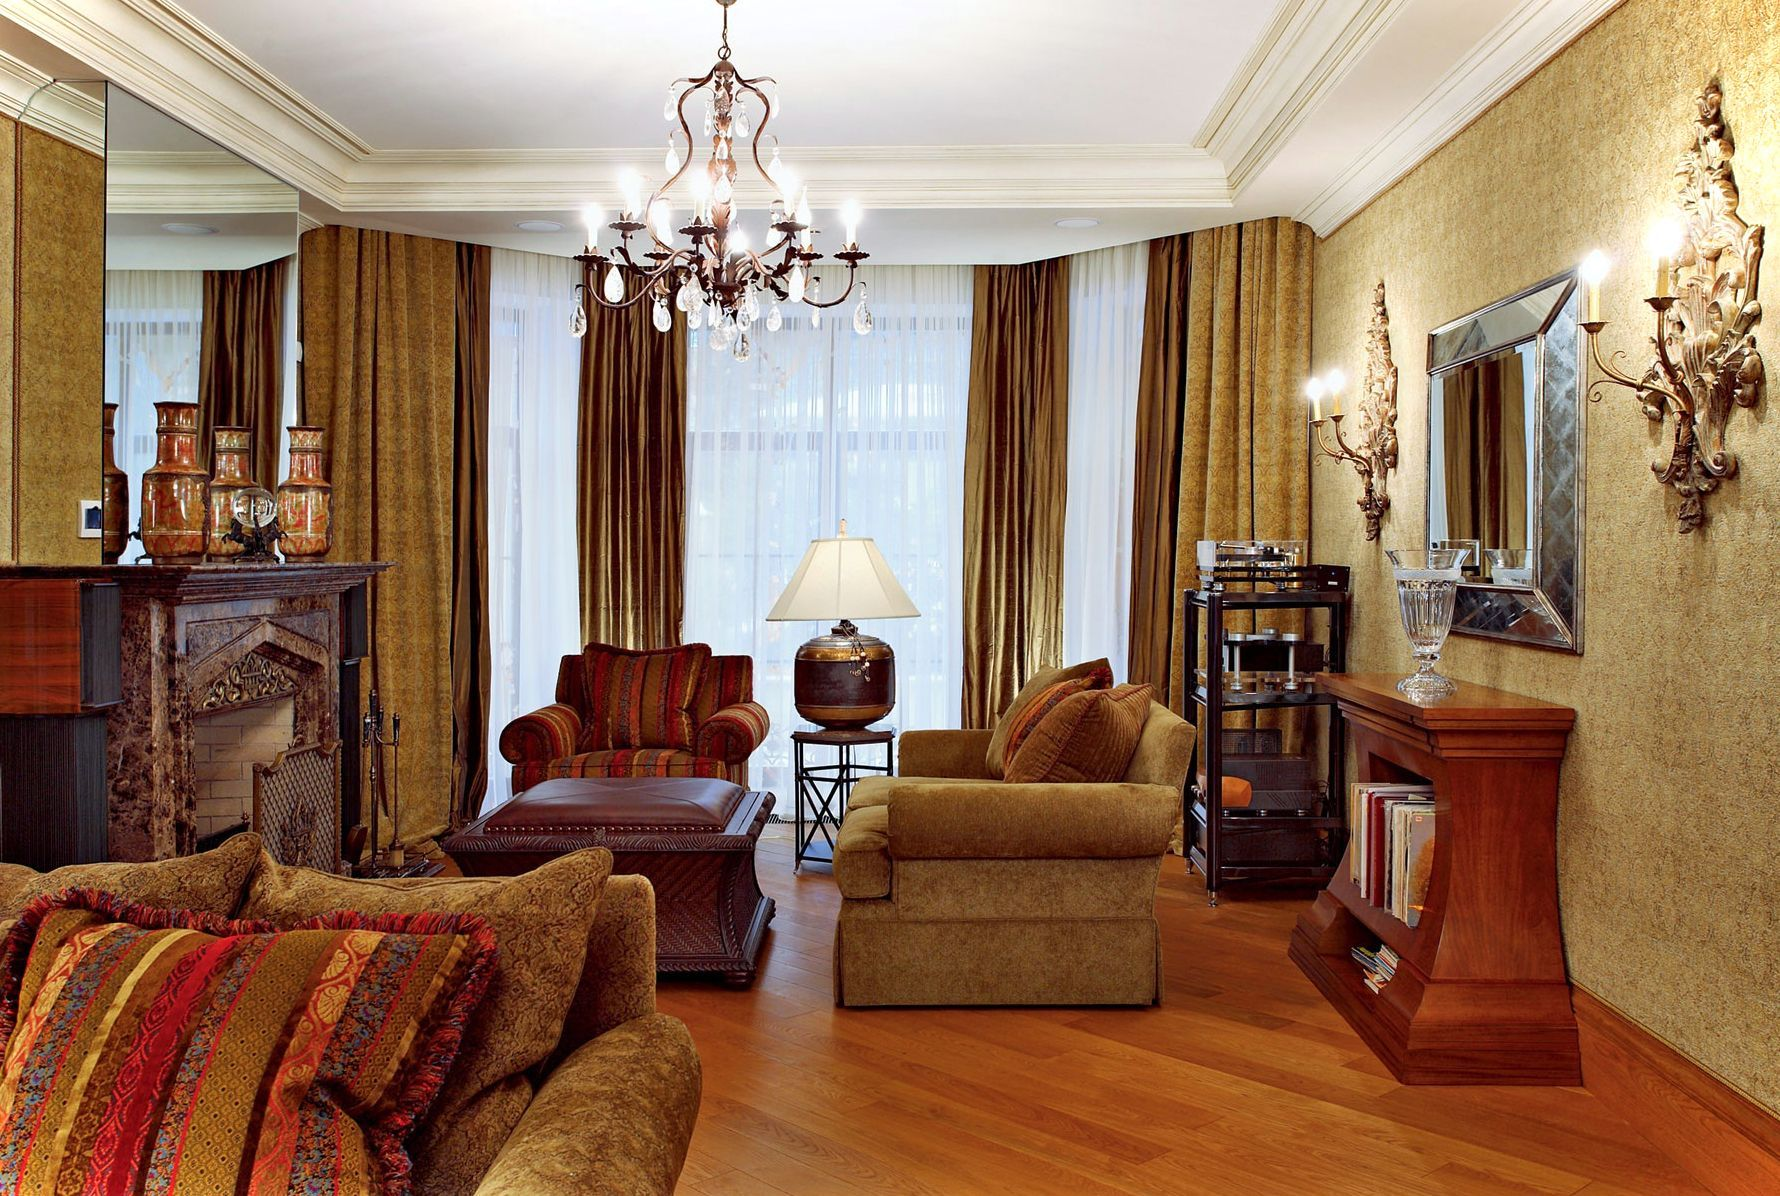 https://www.google.pl/search?q=Victorian interiors